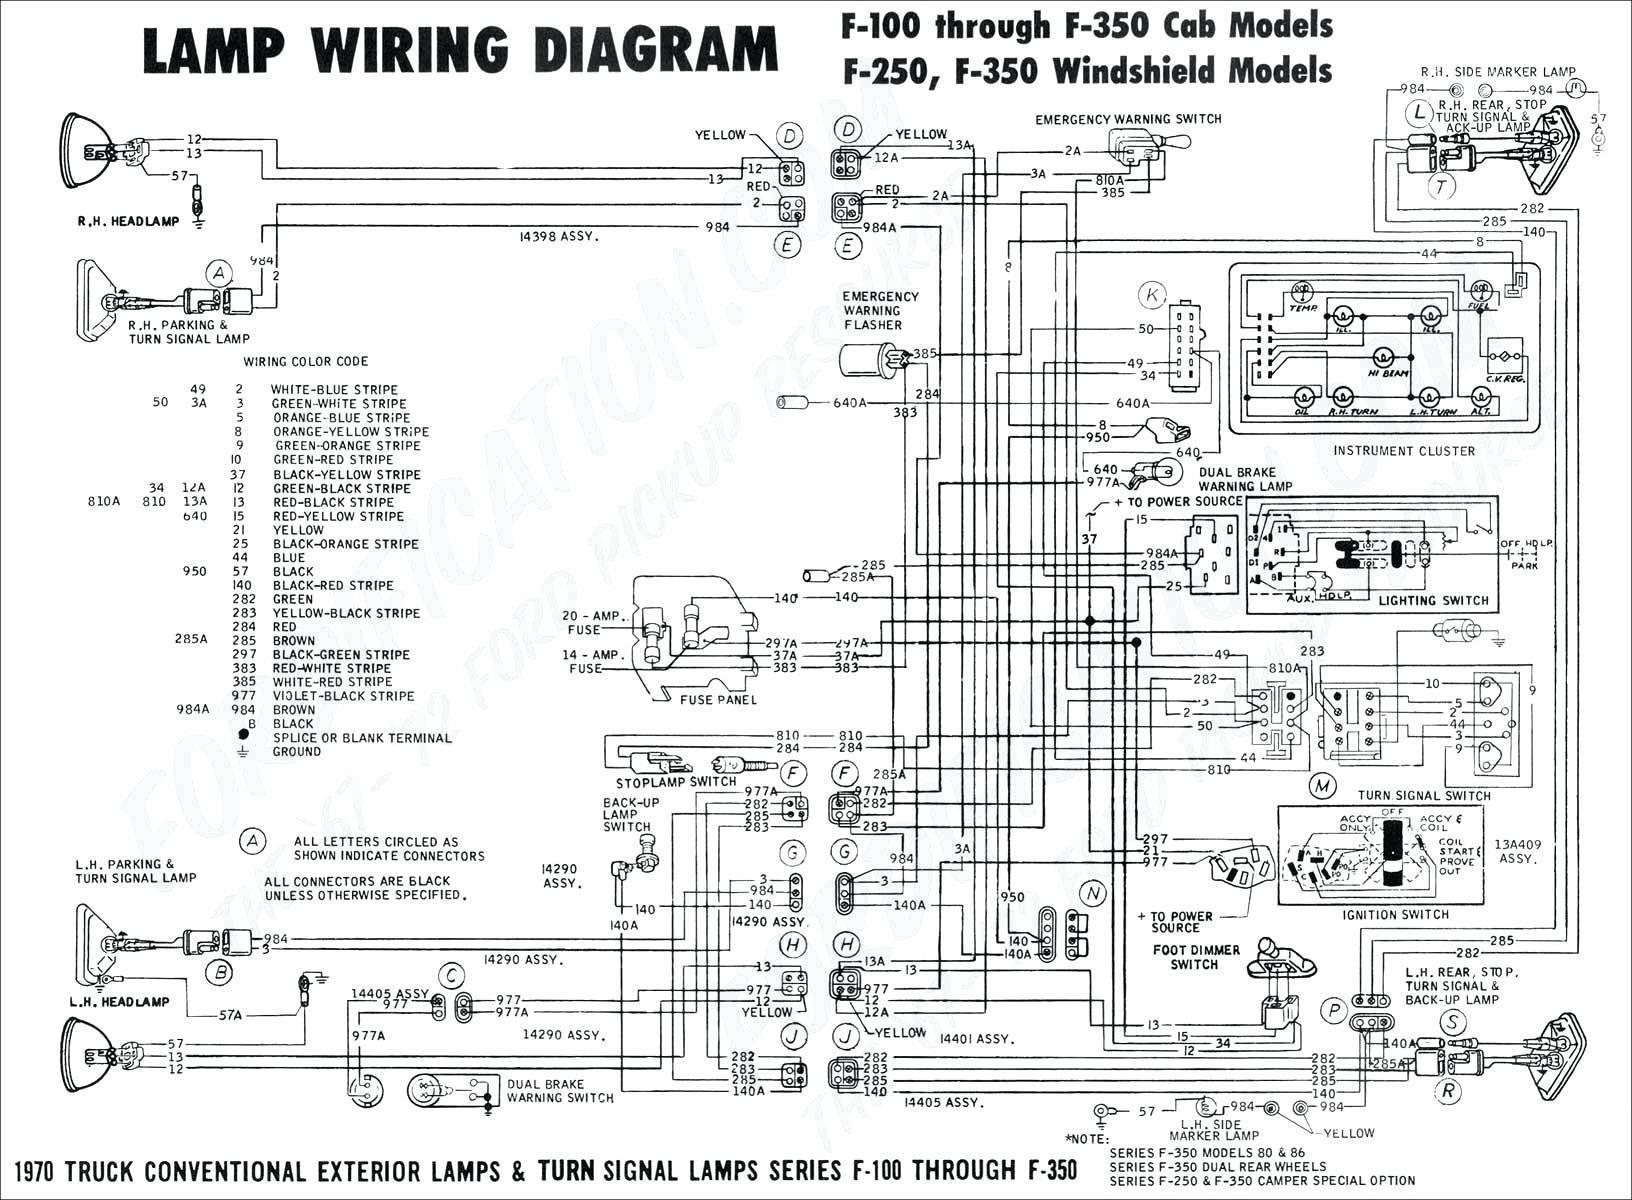 John Deere Wiring Diagram Download Best Of John Deere Wiring Diagram - John Deere Wiring Diagram Download